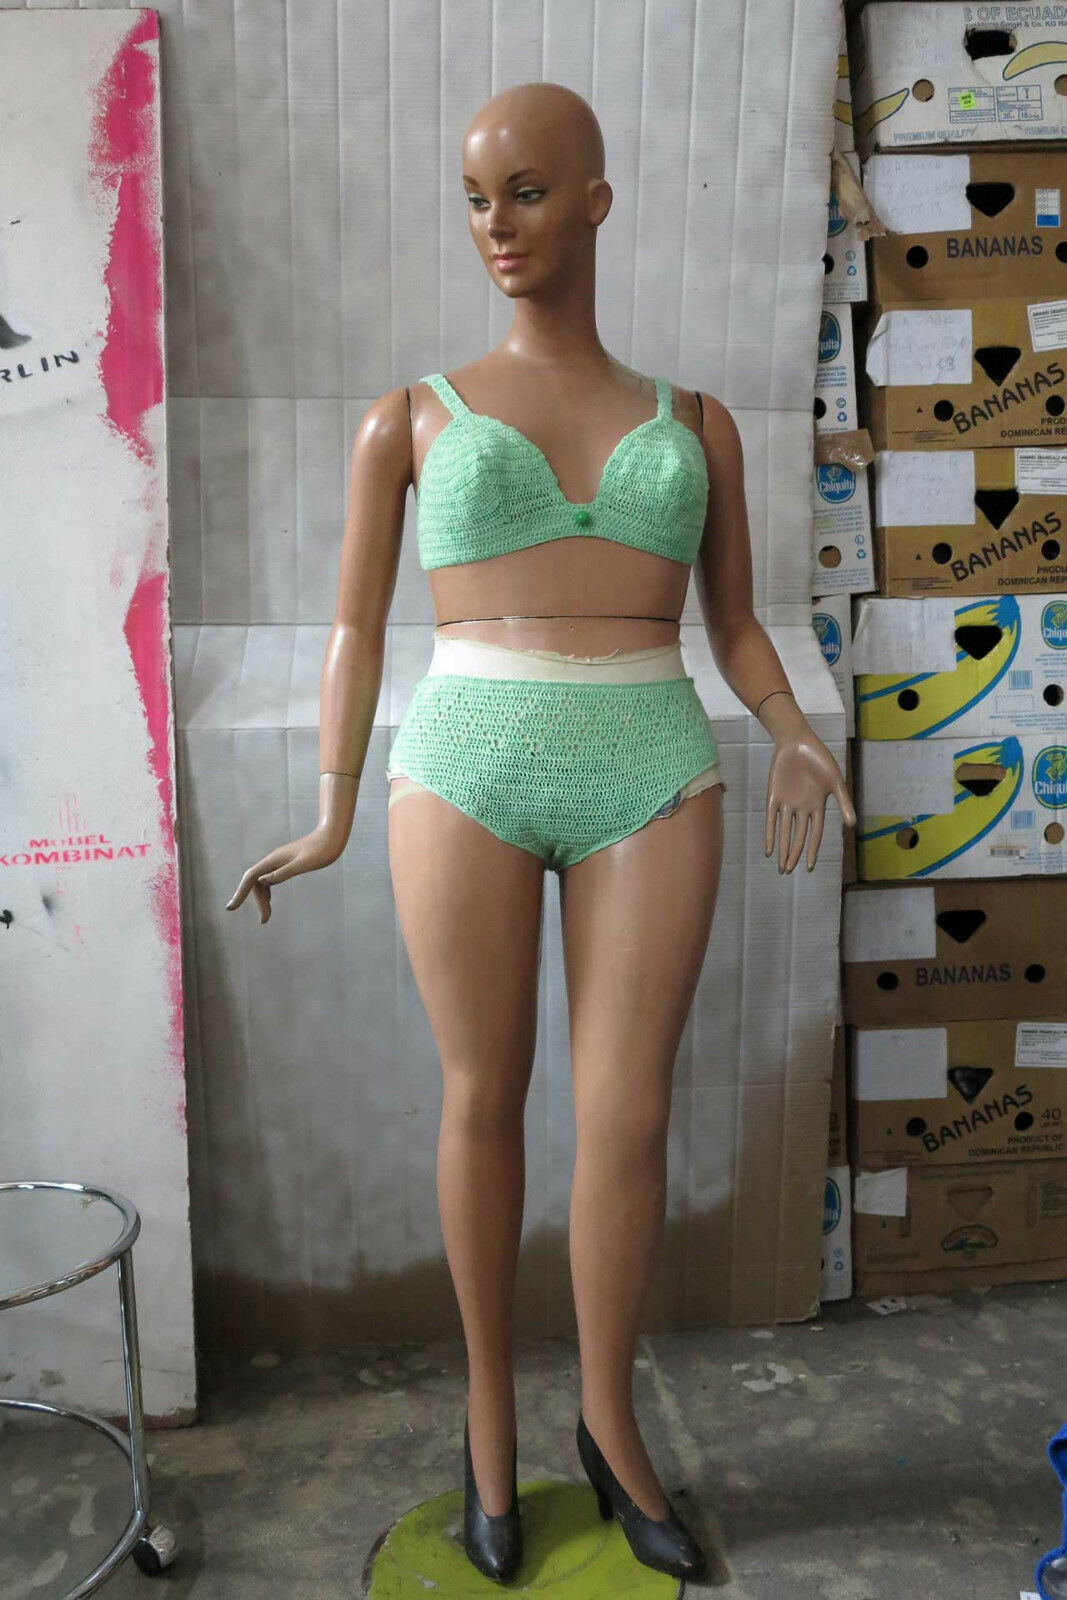 Bikini MINTverde merletto 60er True Vintage 60s donna swimsuit CROCHETED MINT